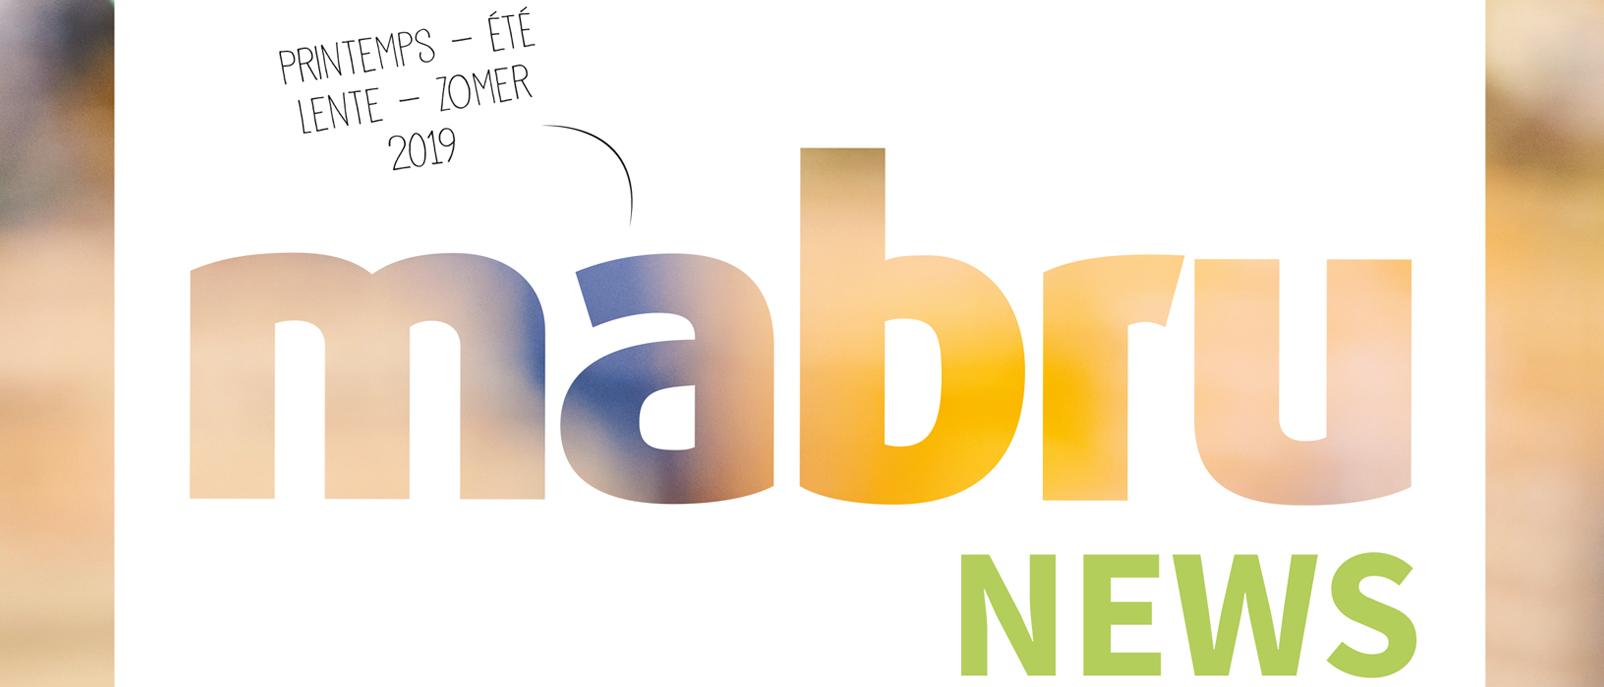 De Mabru News Lente-Zomer 2019 is uit